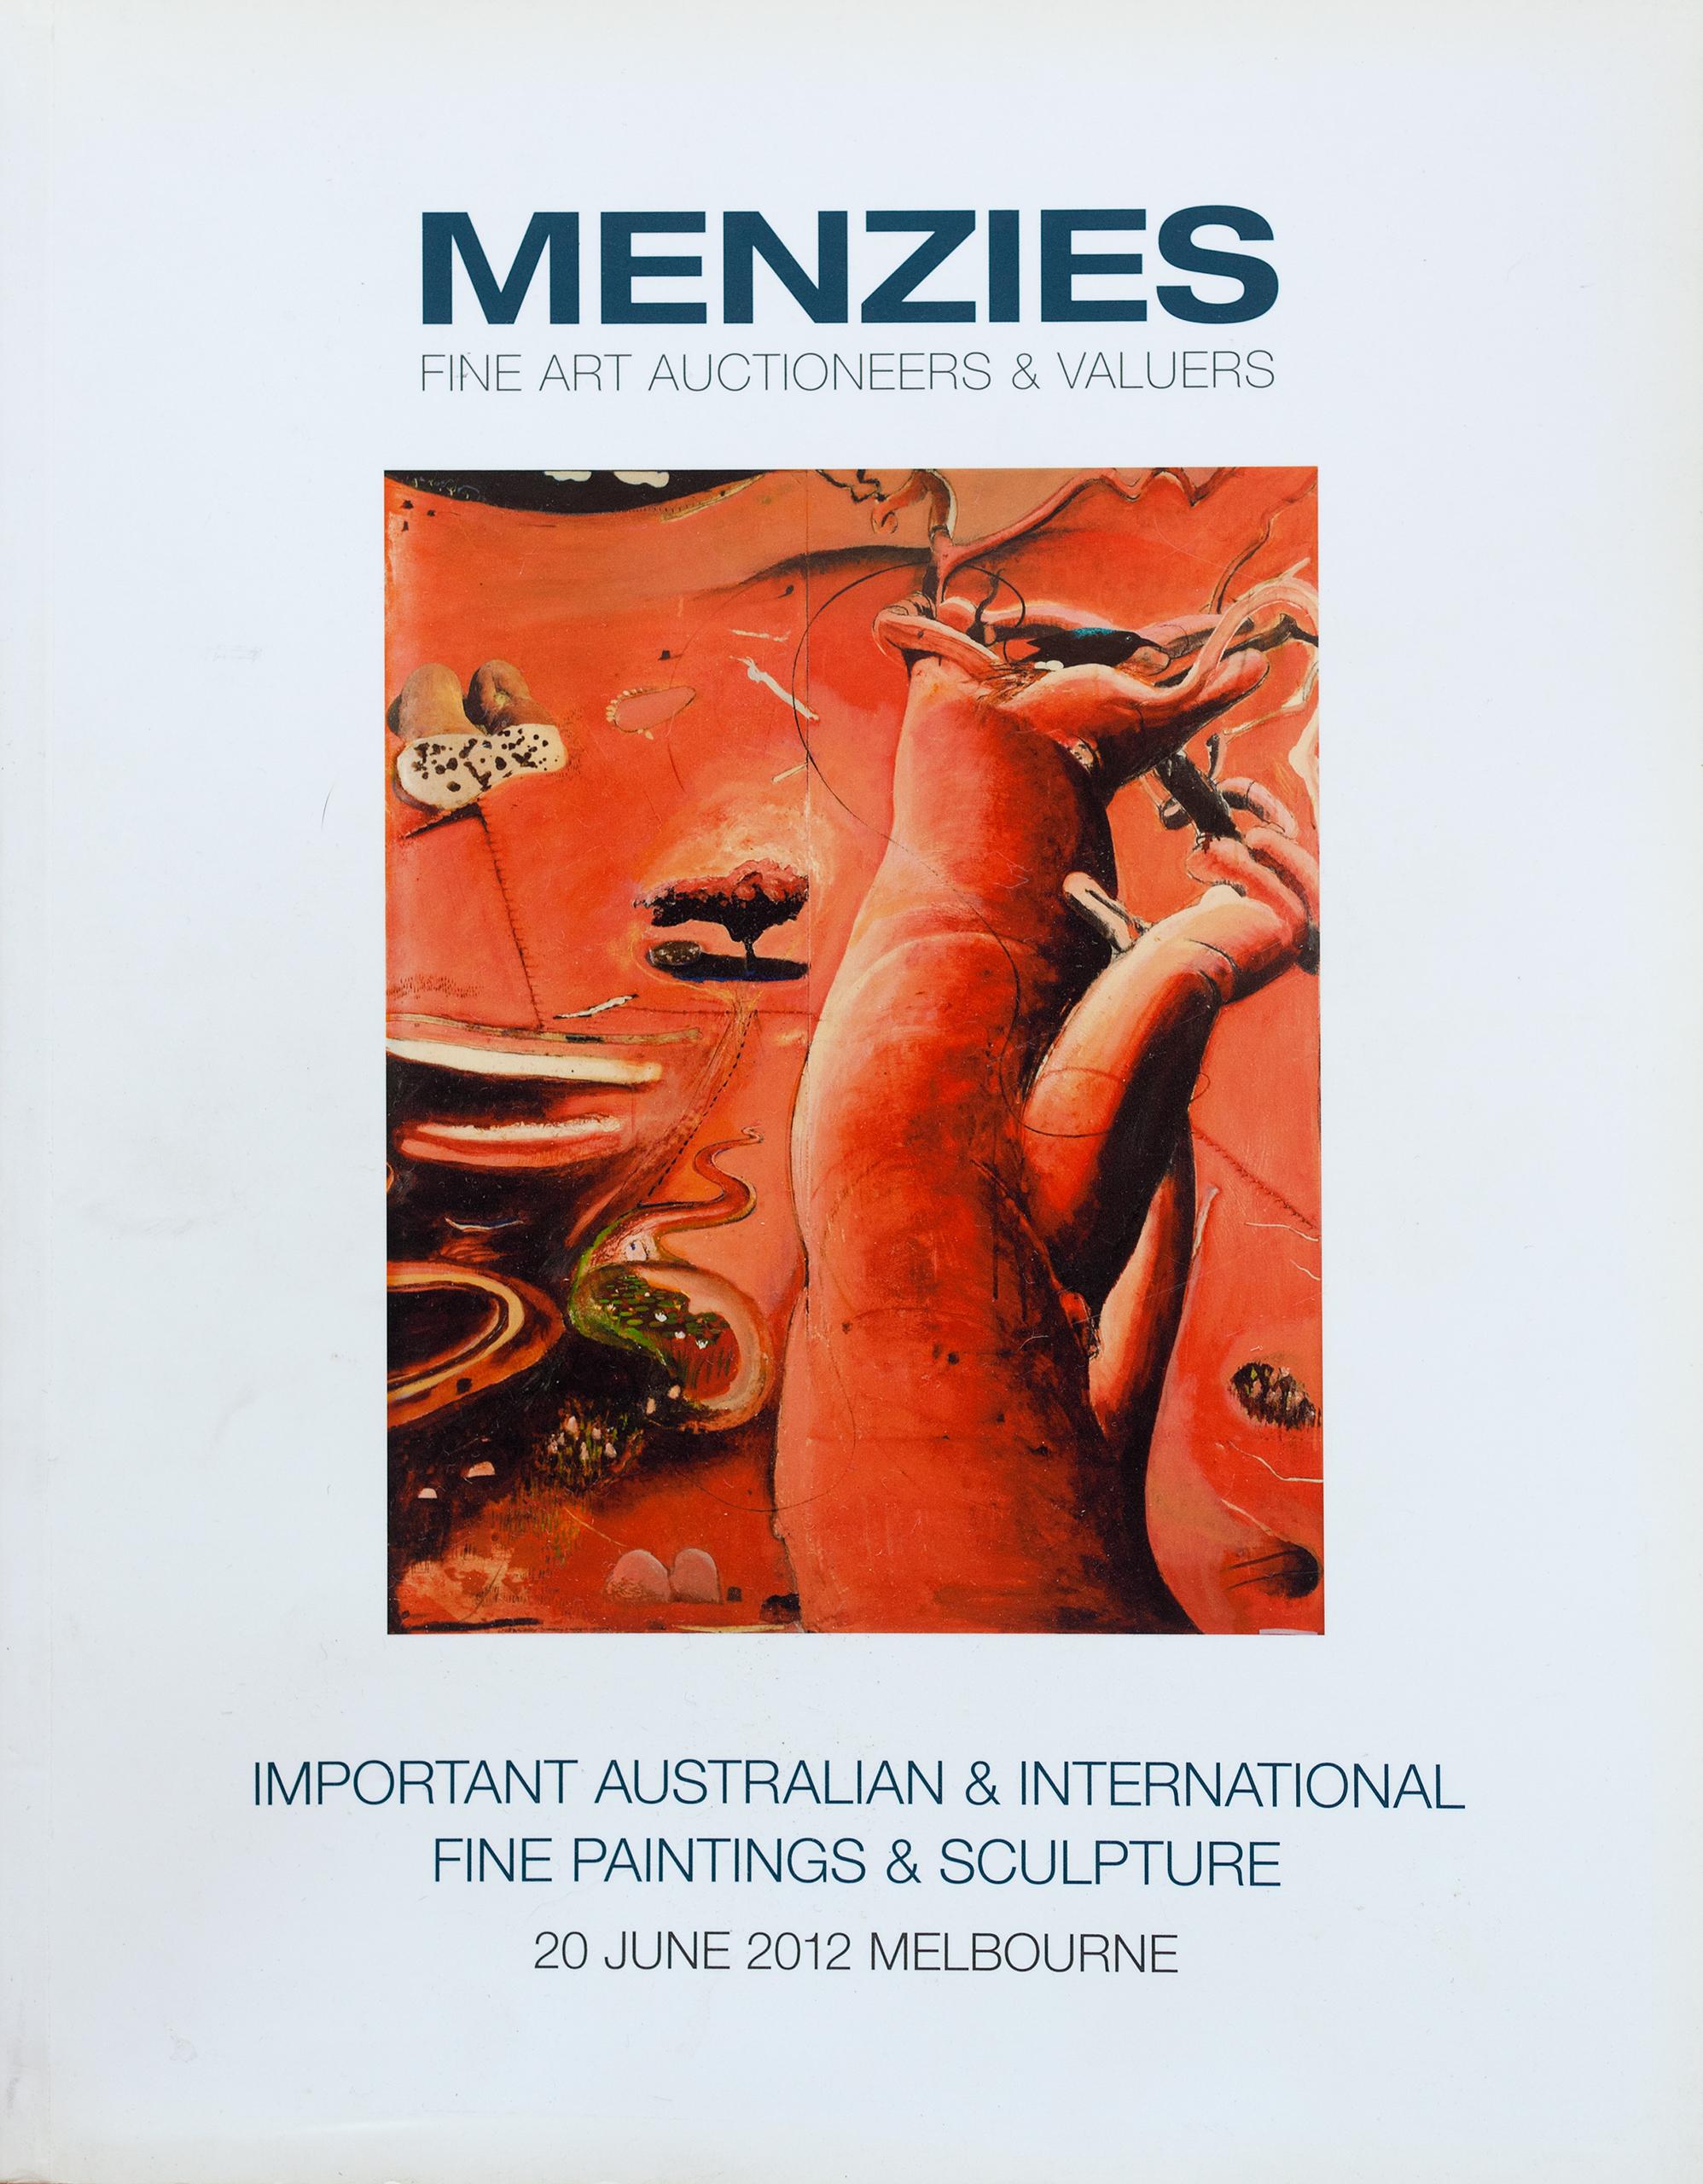 171023 Menzies Catalogues_006.jpg